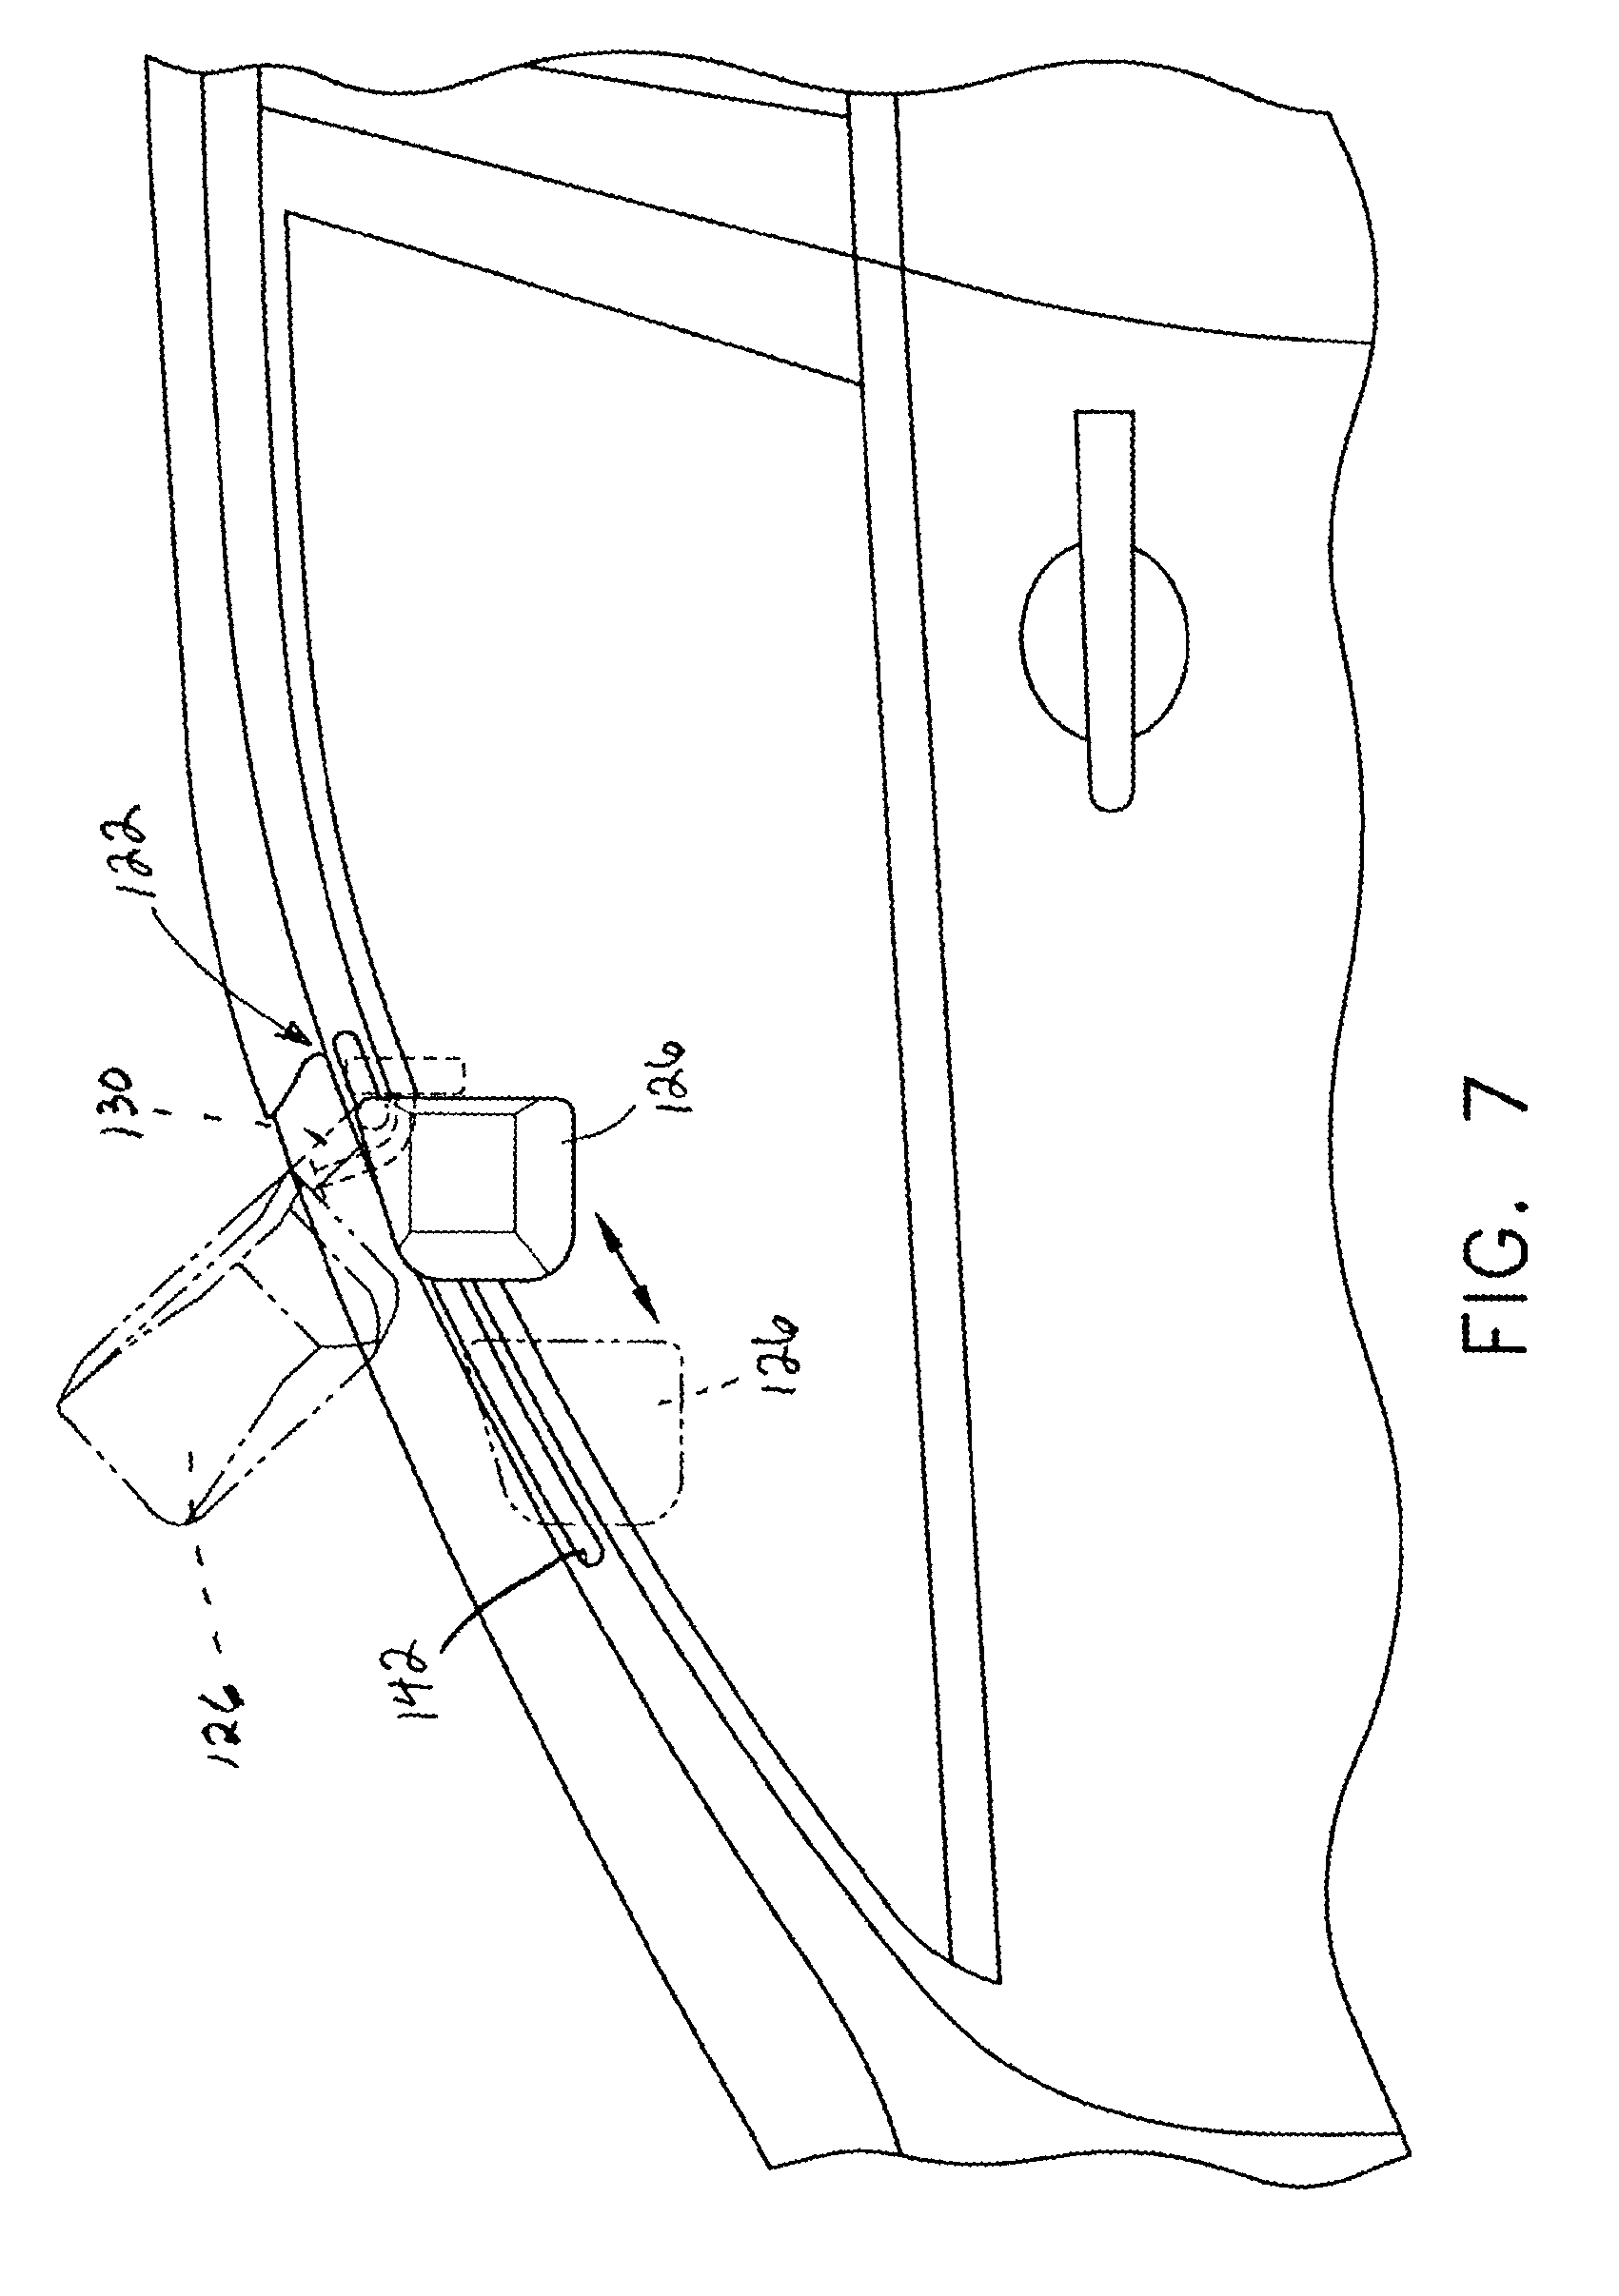 bargman tail light wiring diagram Wiring Diagram for Breaker Panel